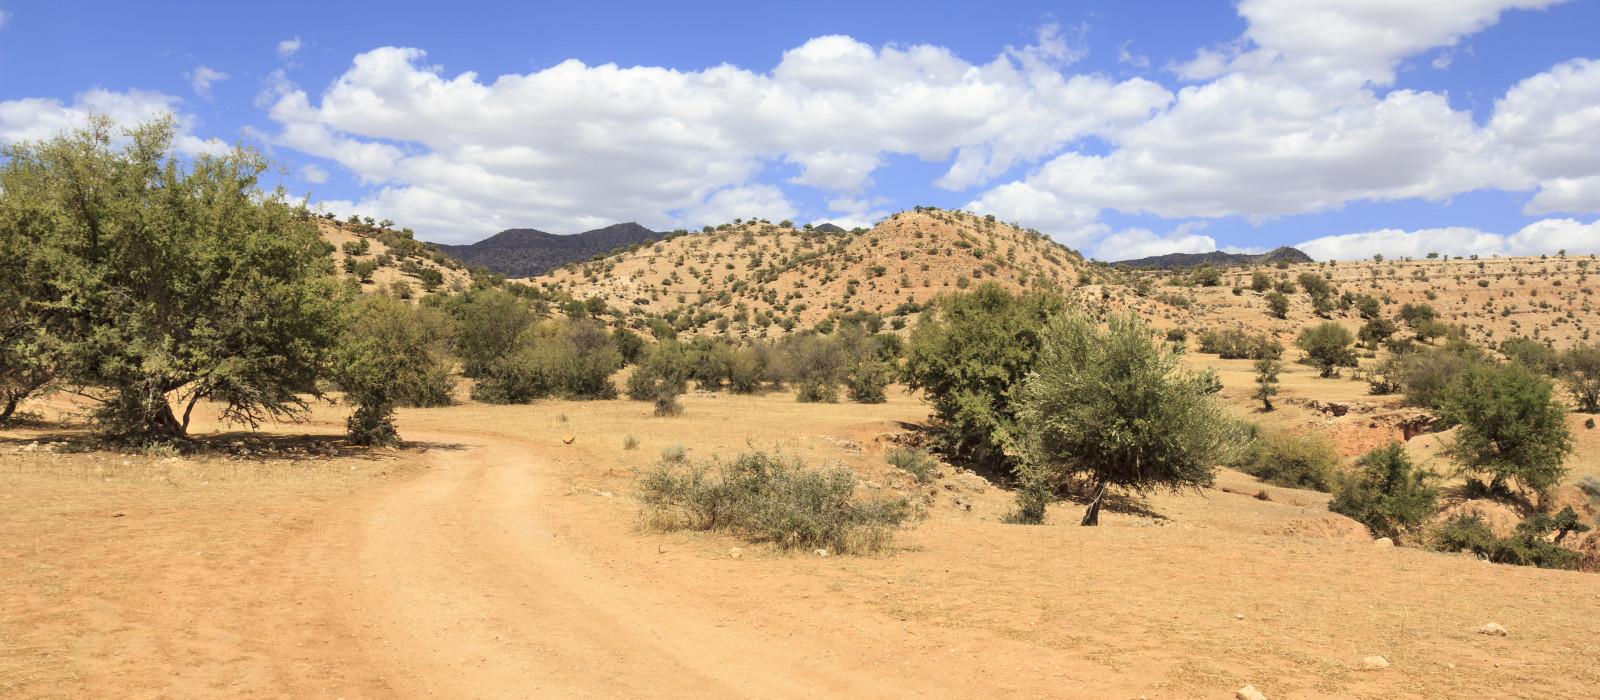 Reiseziel Taroudant Marokko